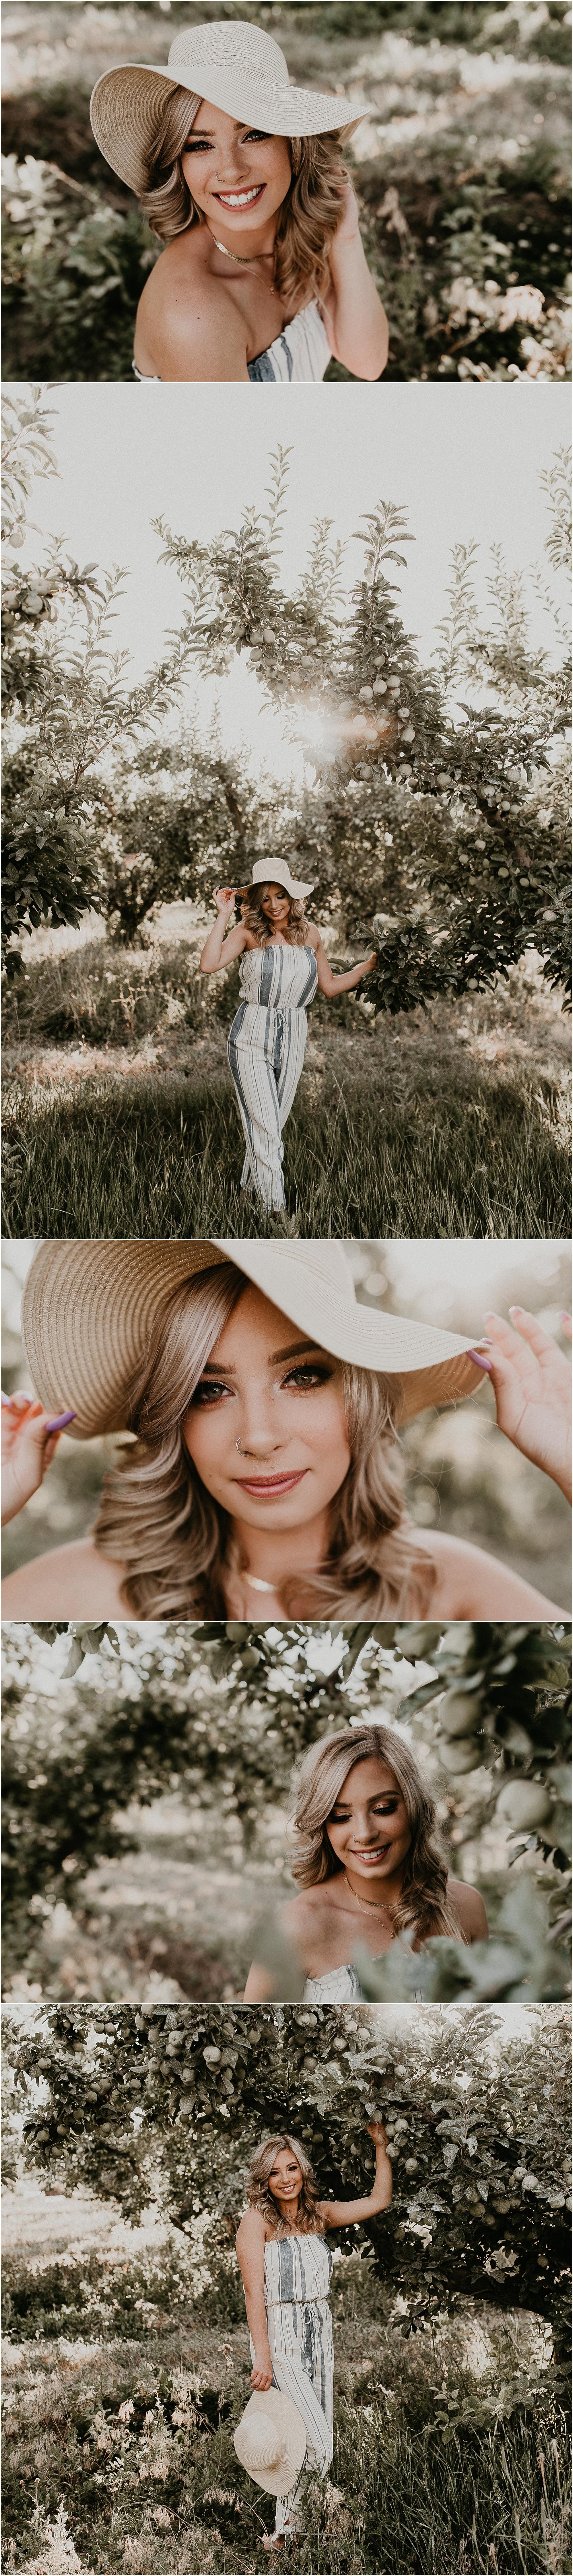 Boise Senior Photographer Idaho Apple Orchard Summer Senior Pics Senior Girl Outfit Ideas Jumpsuit Inspiration Top Senior Portraits